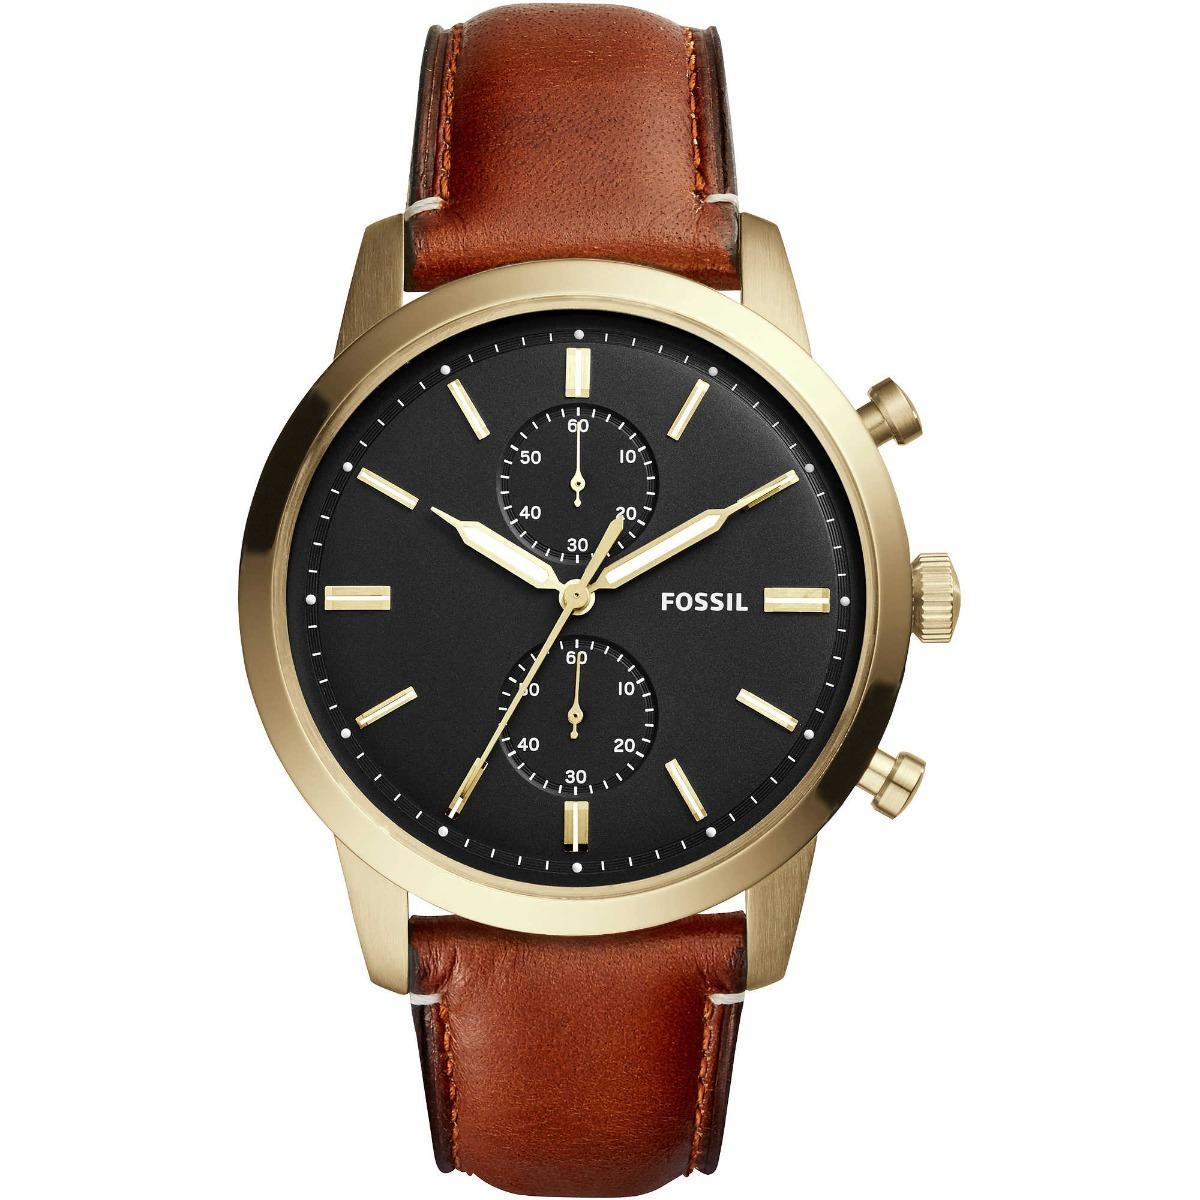 92006d8d8751 reloj fossil townsman chronograph fs5338 para hombre cafe. Cargando zoom.